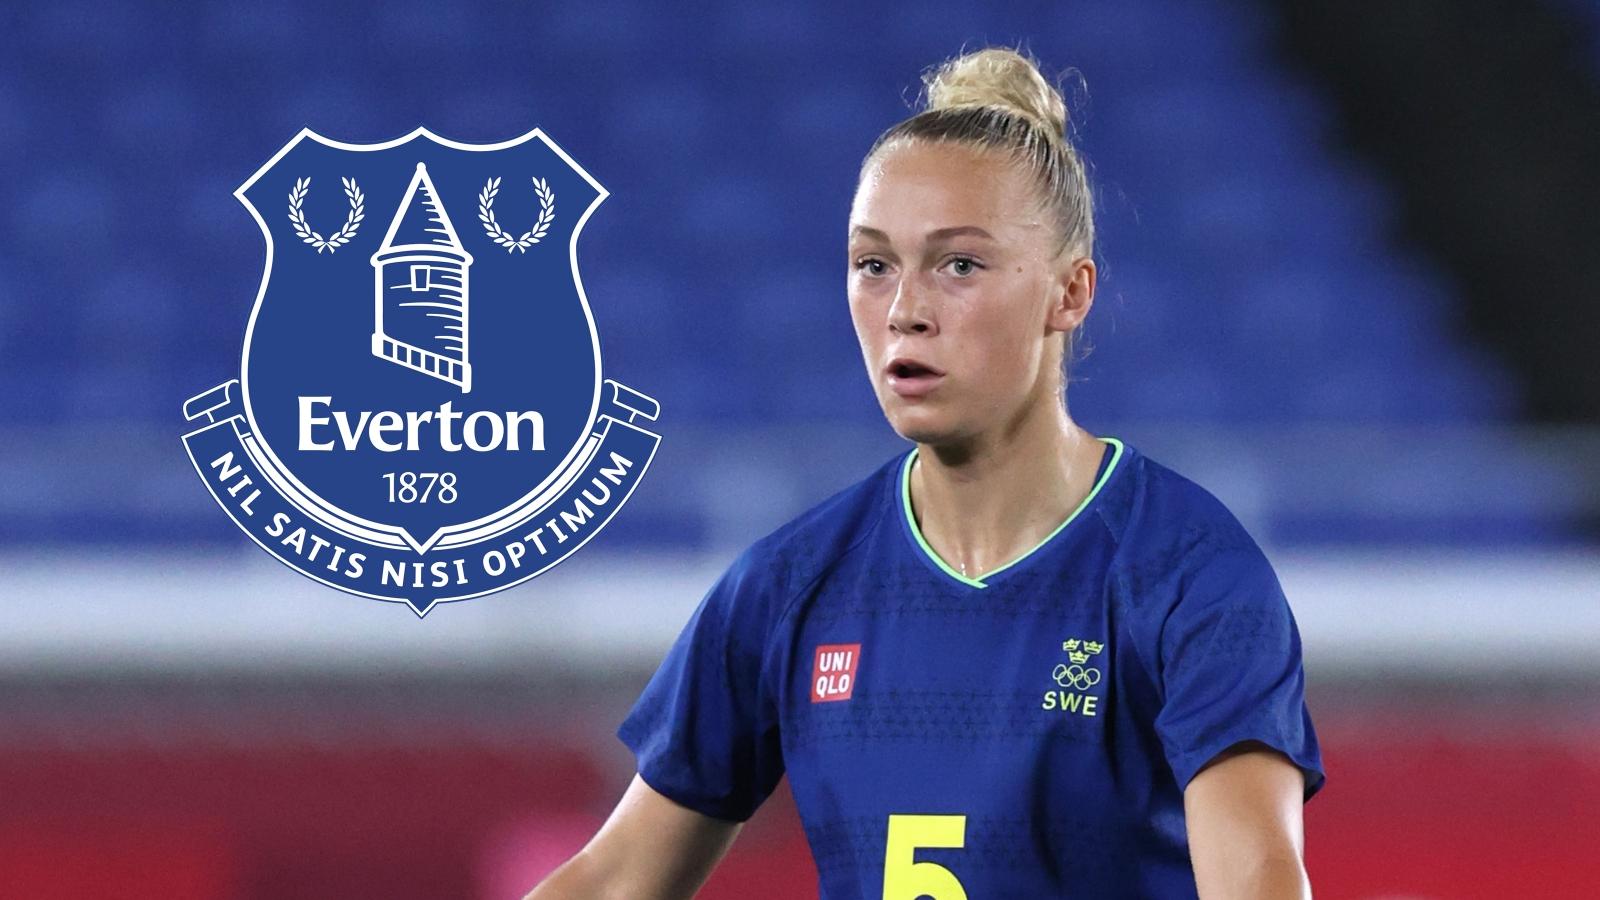 Everton announce signing of Sweden wonderkid and 2021 NXGN winner Bennison